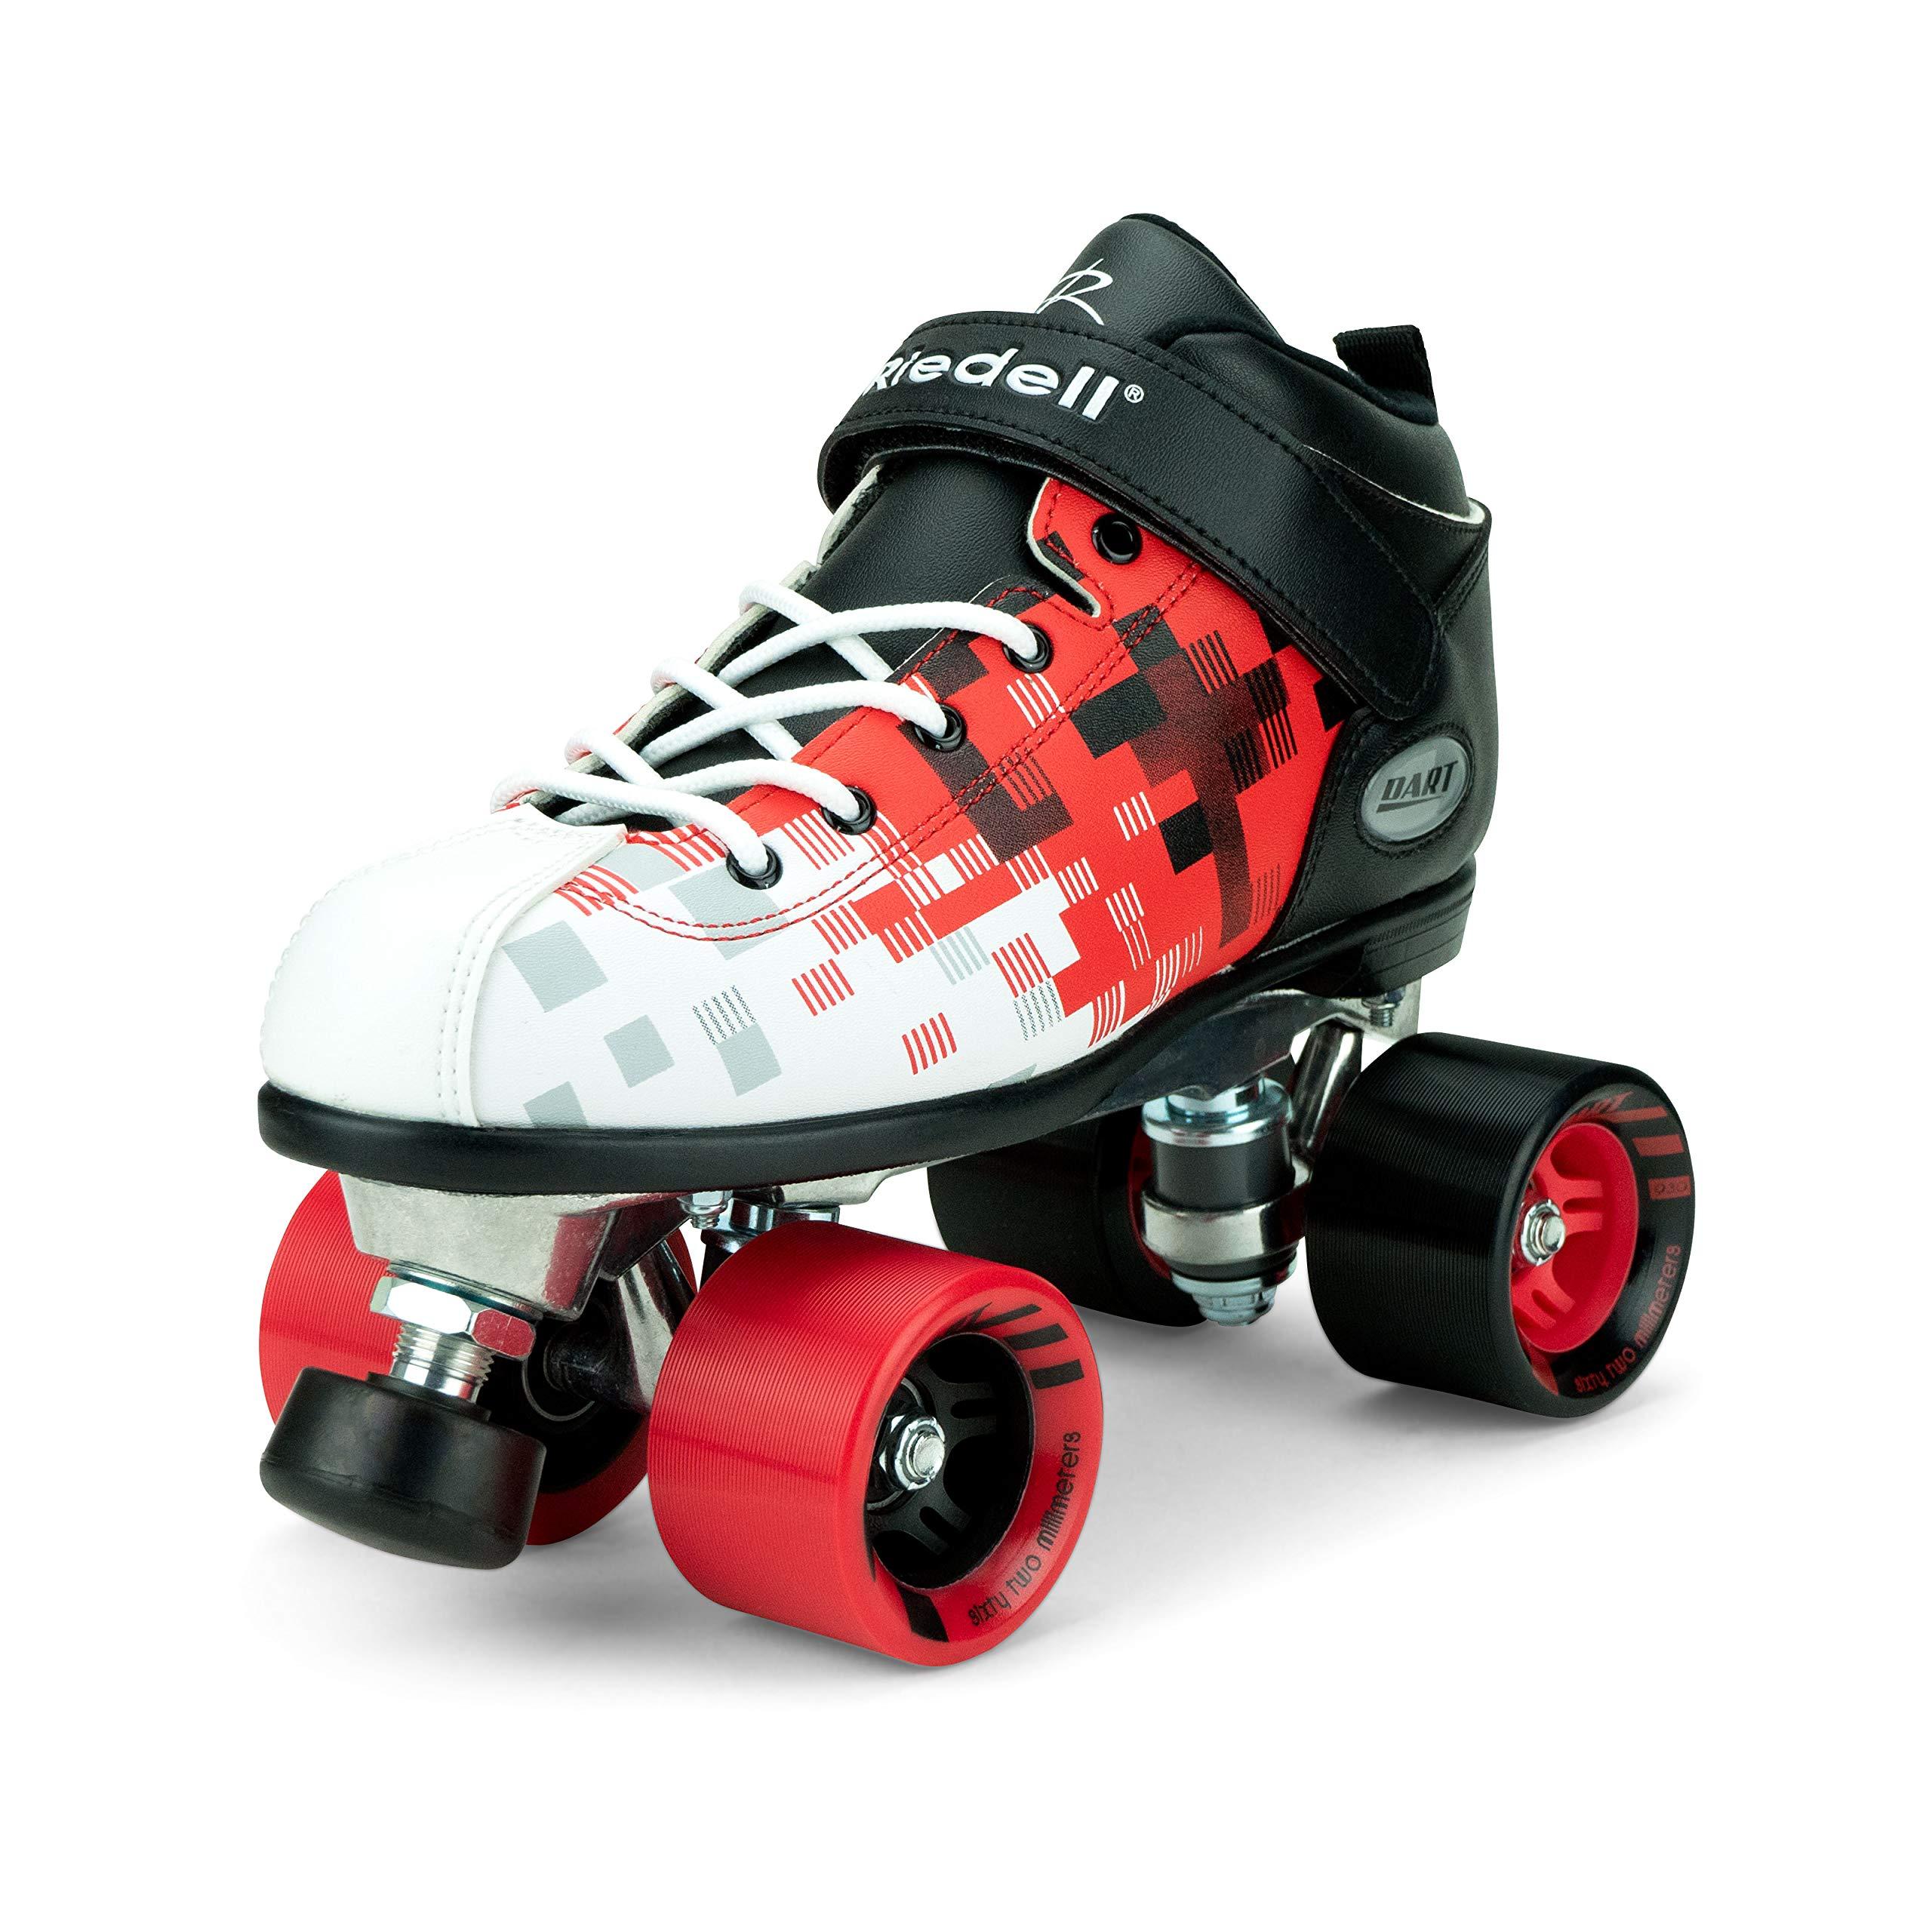 Riedell Skates Pixel Roller Speed